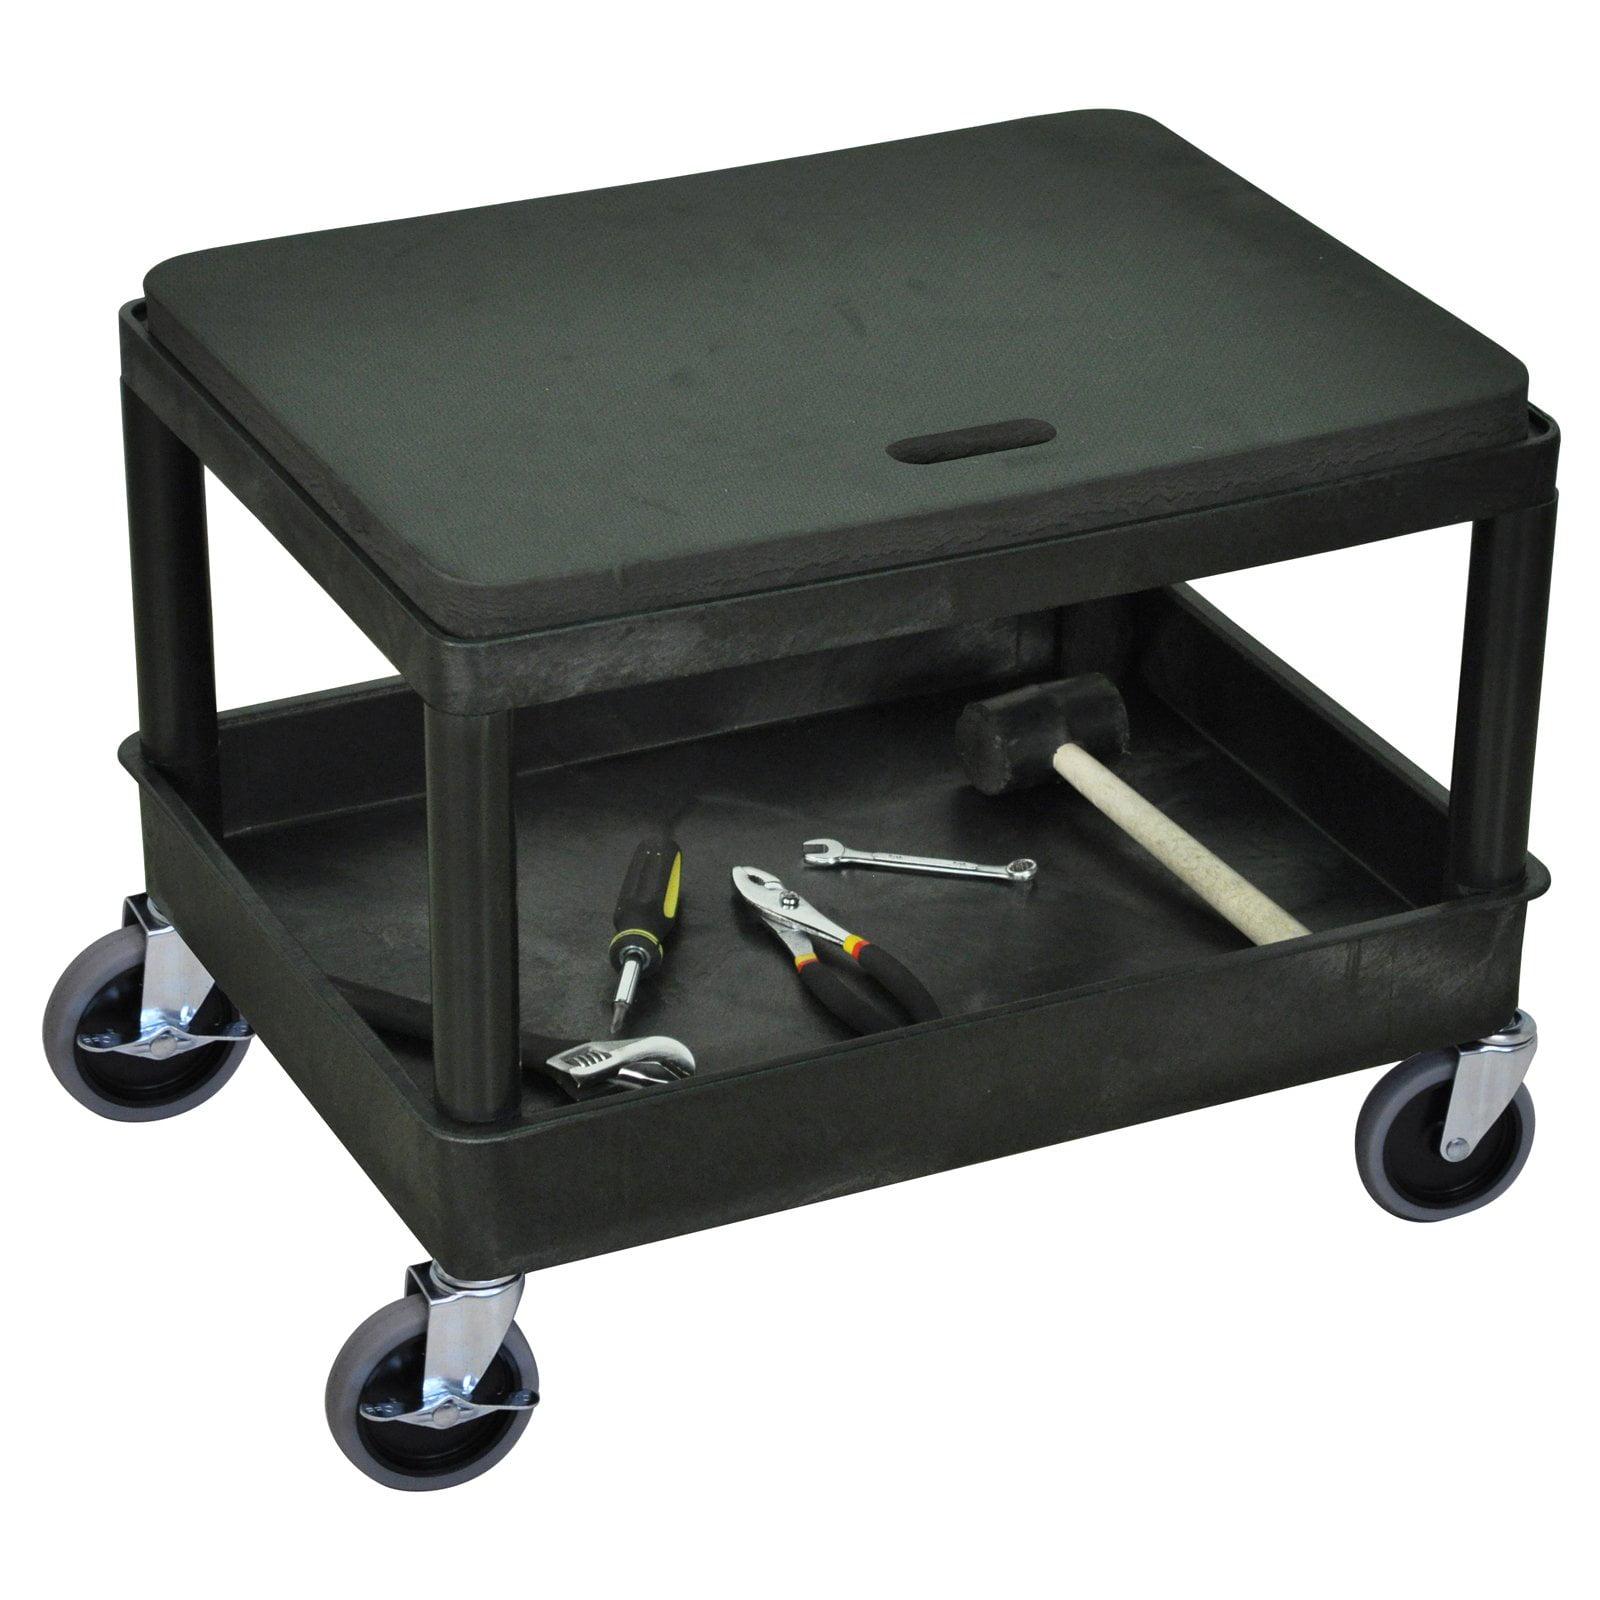 Luxor Mechanics Seat with Foam Pad